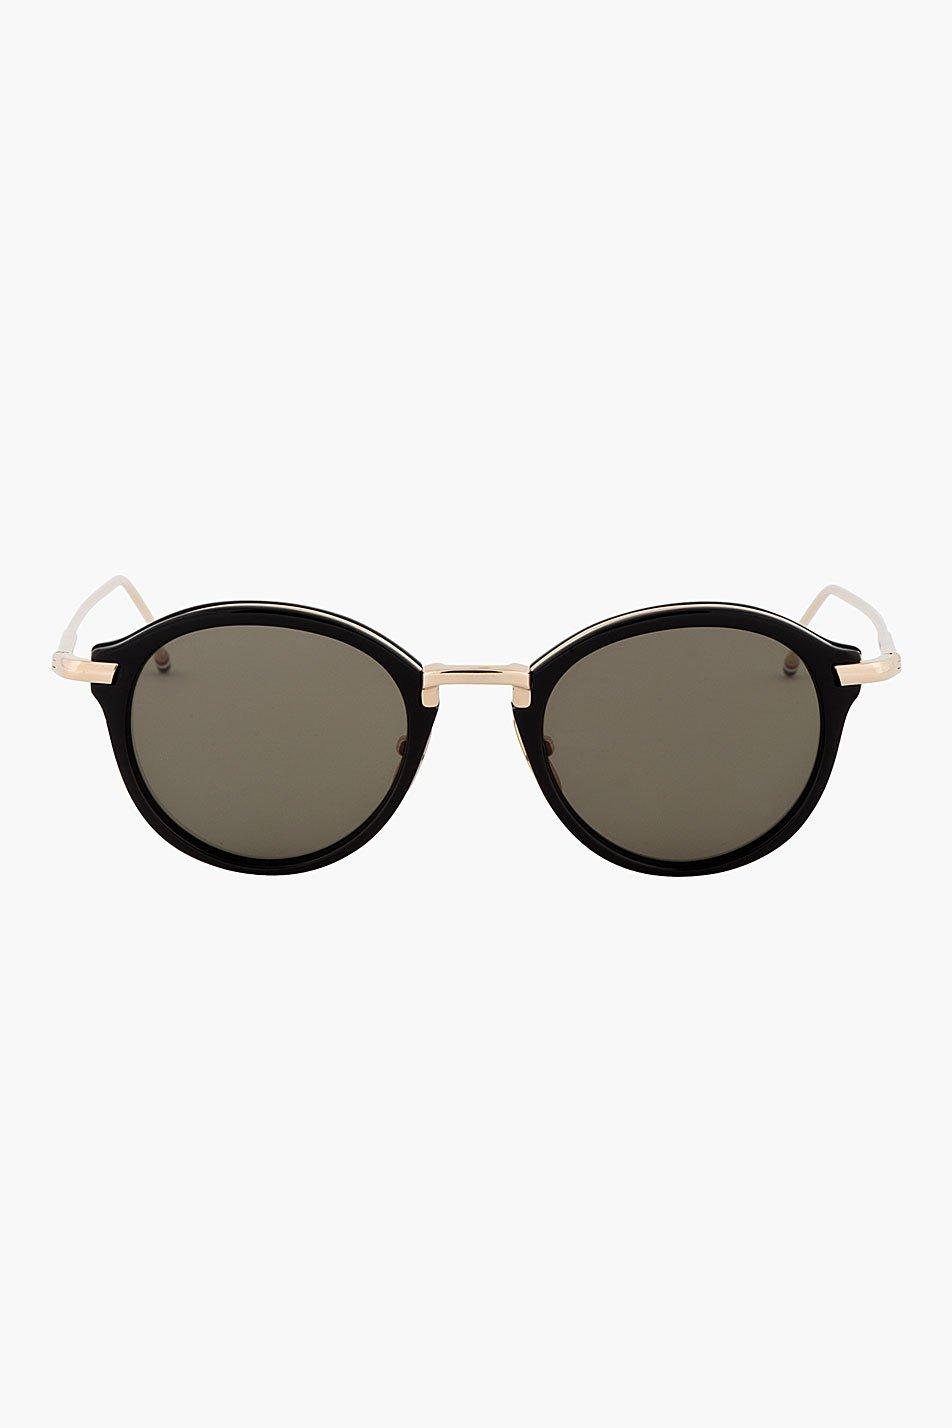 Black And Gold Frame Sunglasses : sunglasses gold frame: Shop for sunglasses gold frame on ...